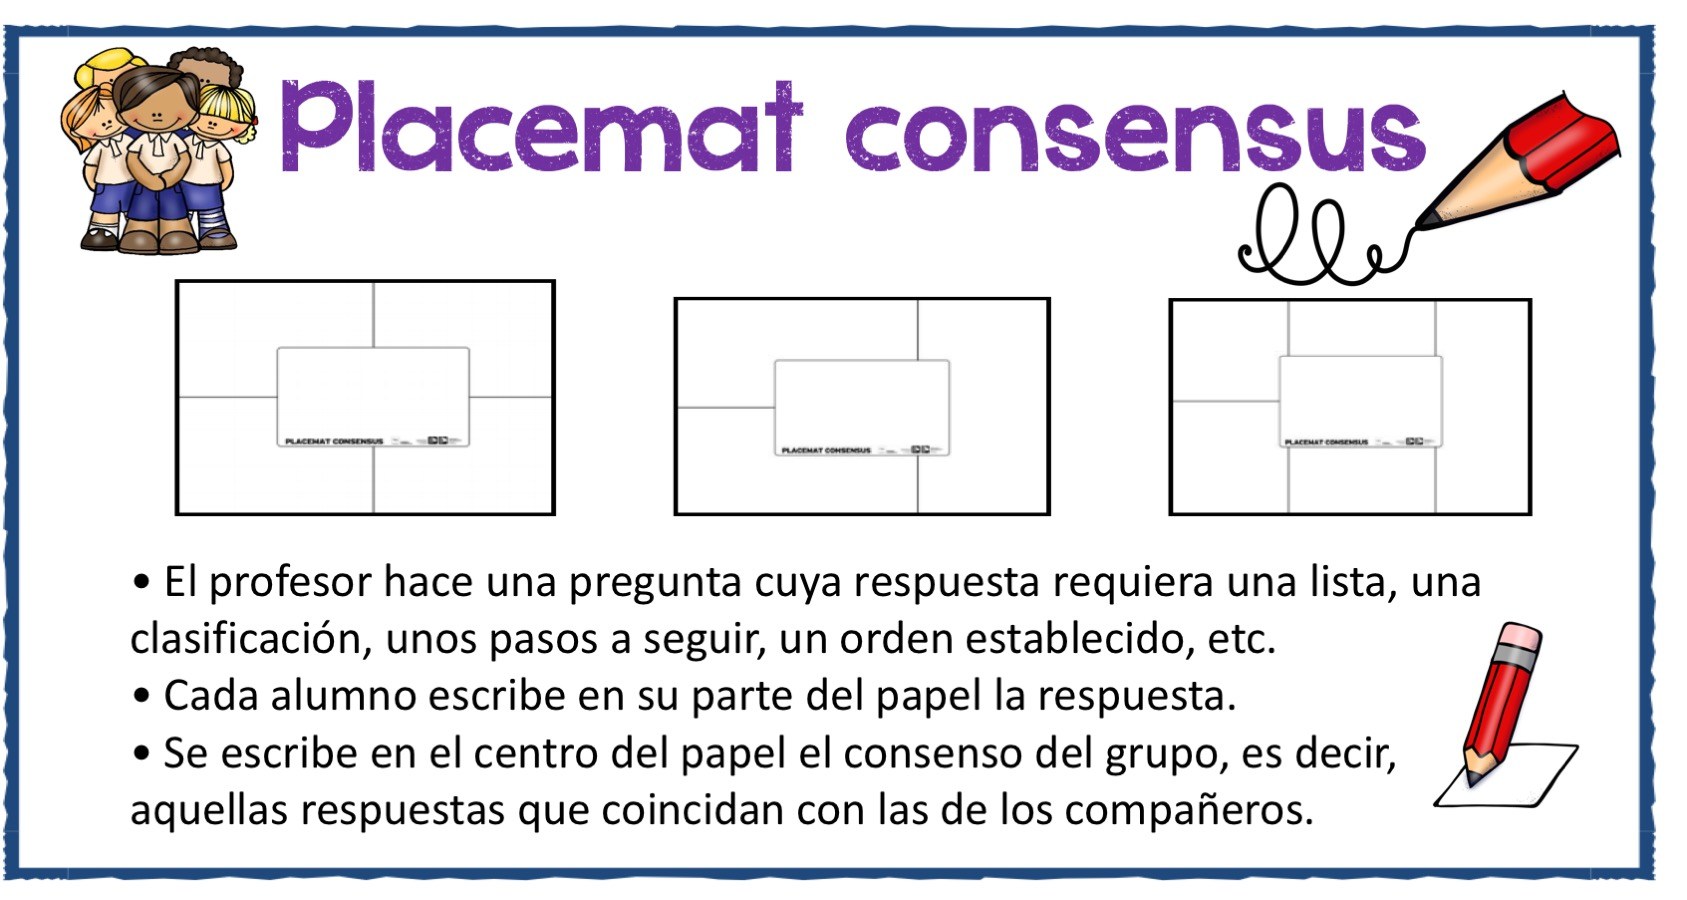 Técnica cooperativa simple Placemat consensus -Orientacion Andujar